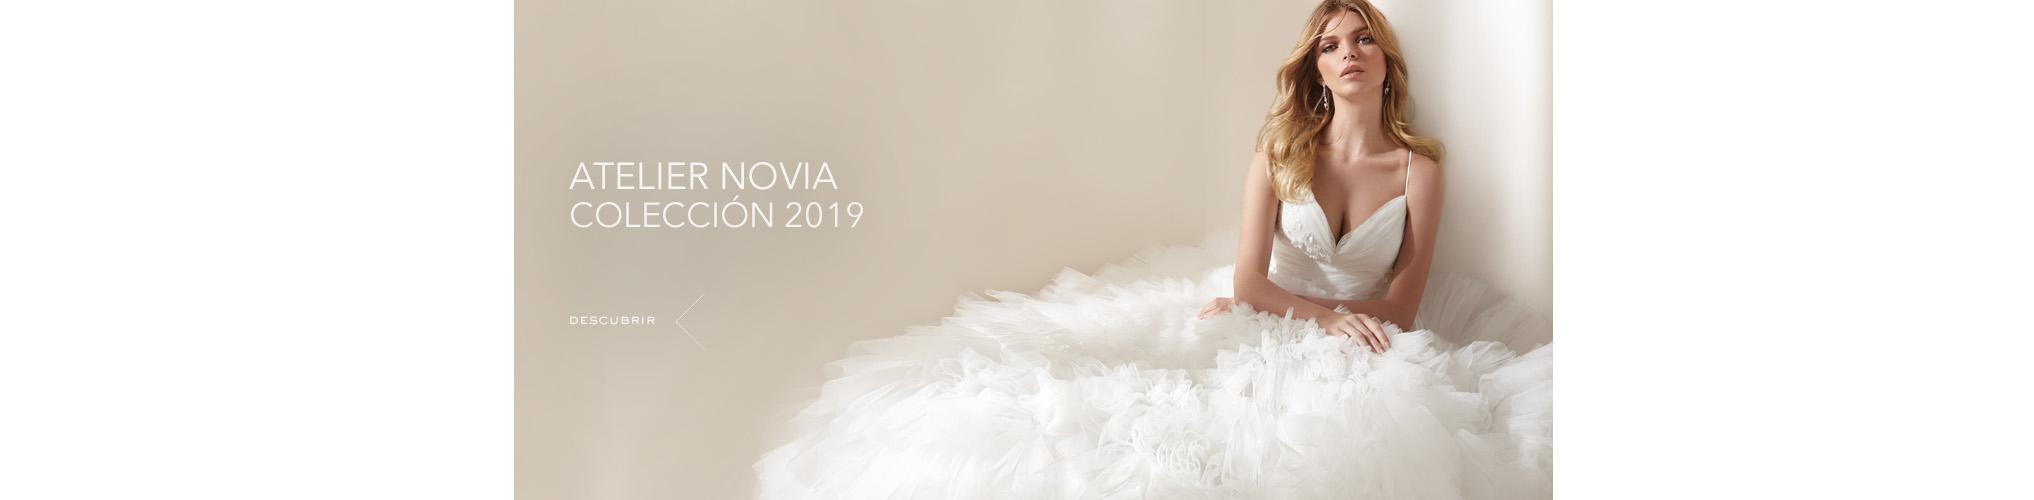 Atelier Novia - Colección 2019